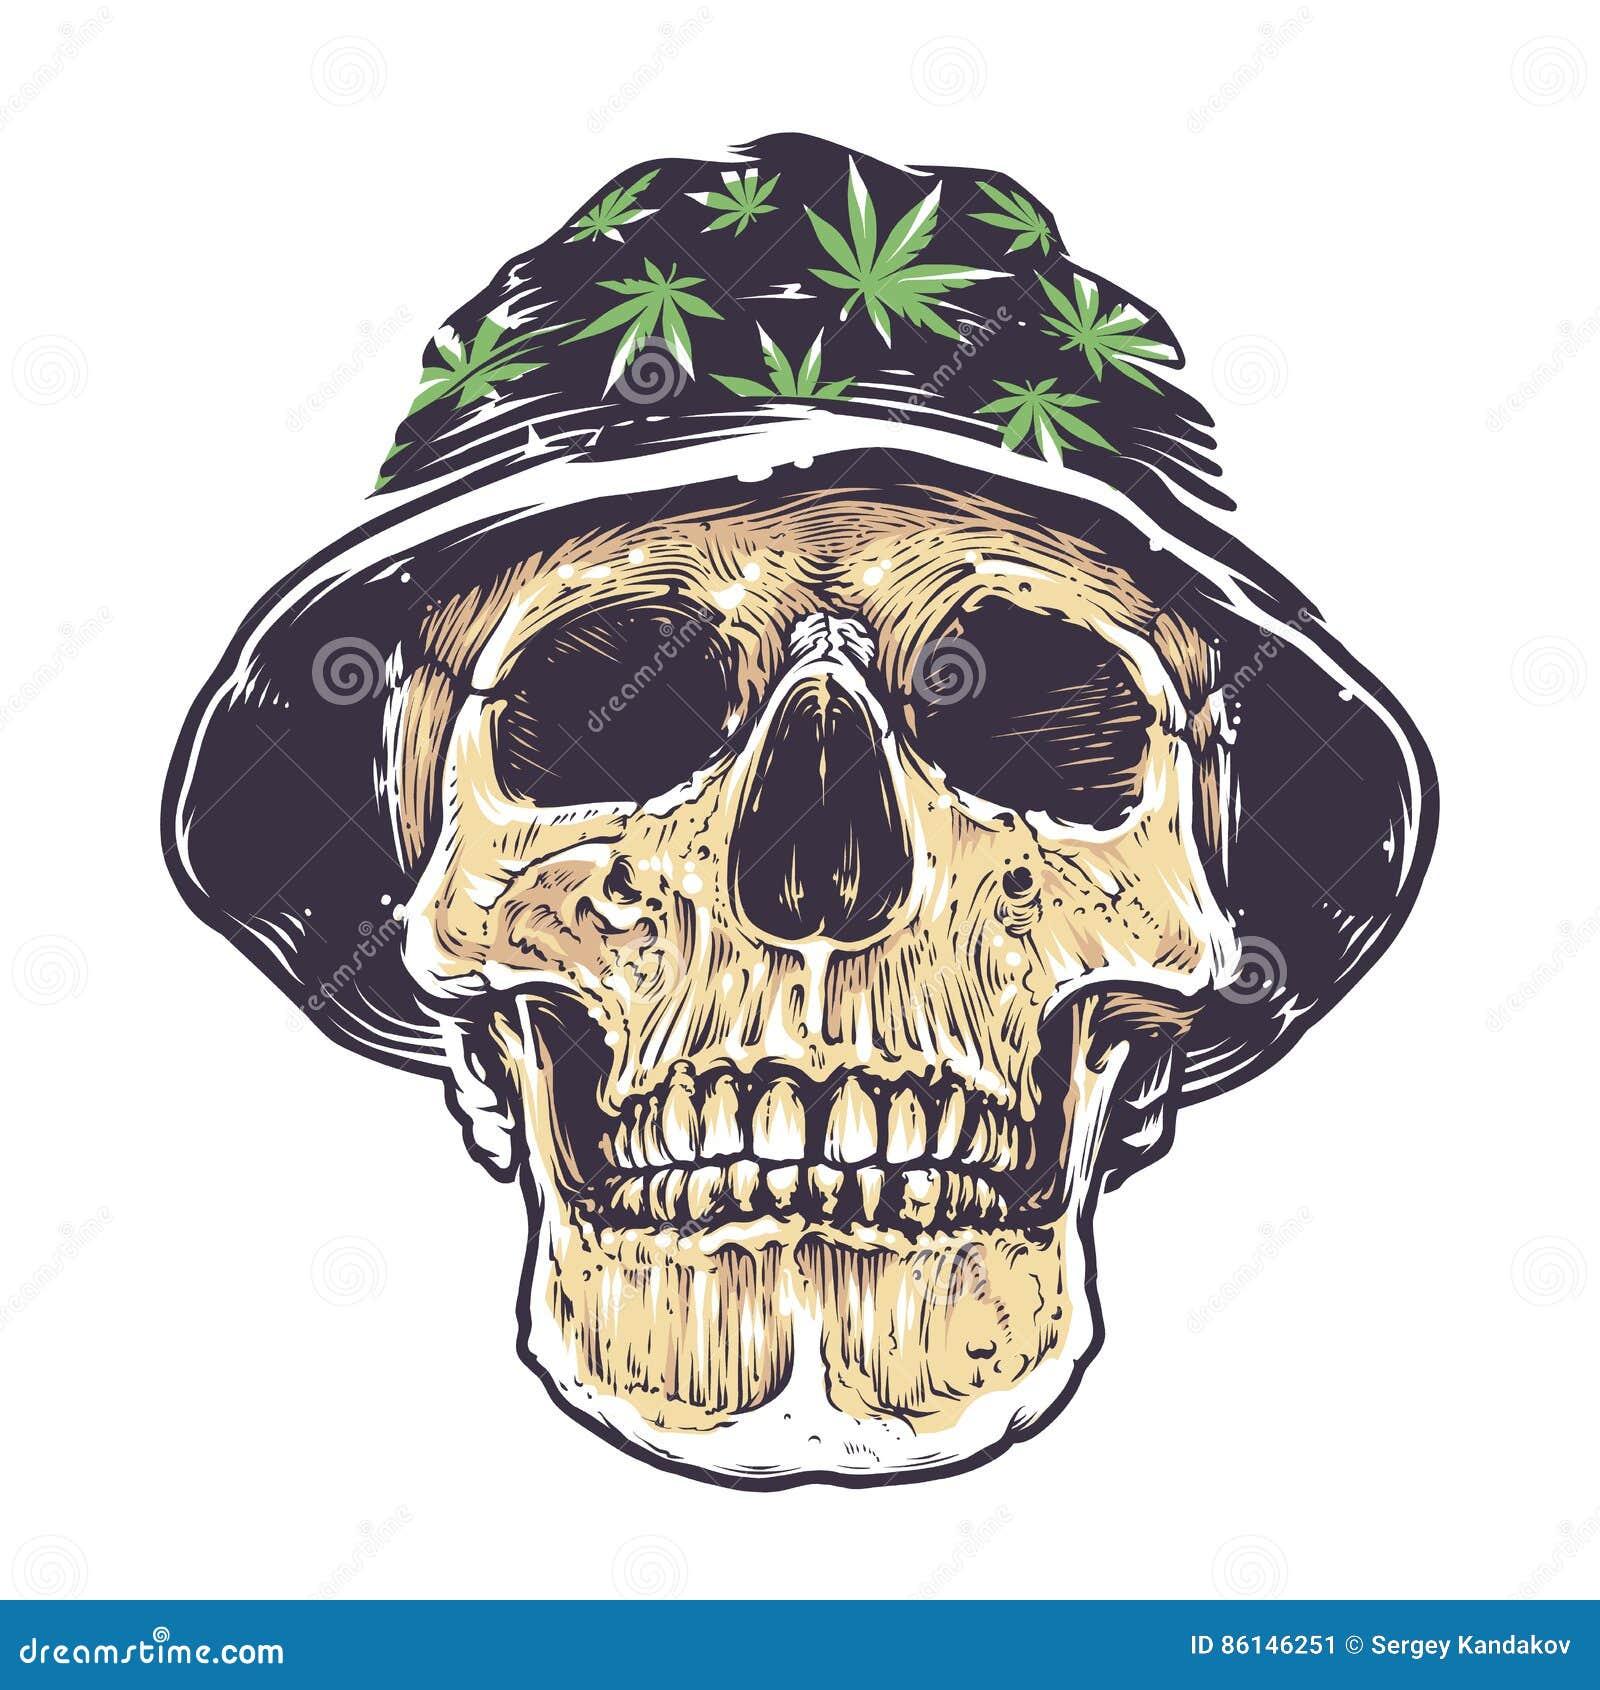 Rasta skull in hat stock vector illustration of symbol 86146251 rasta skull in hat biocorpaavc Image collections